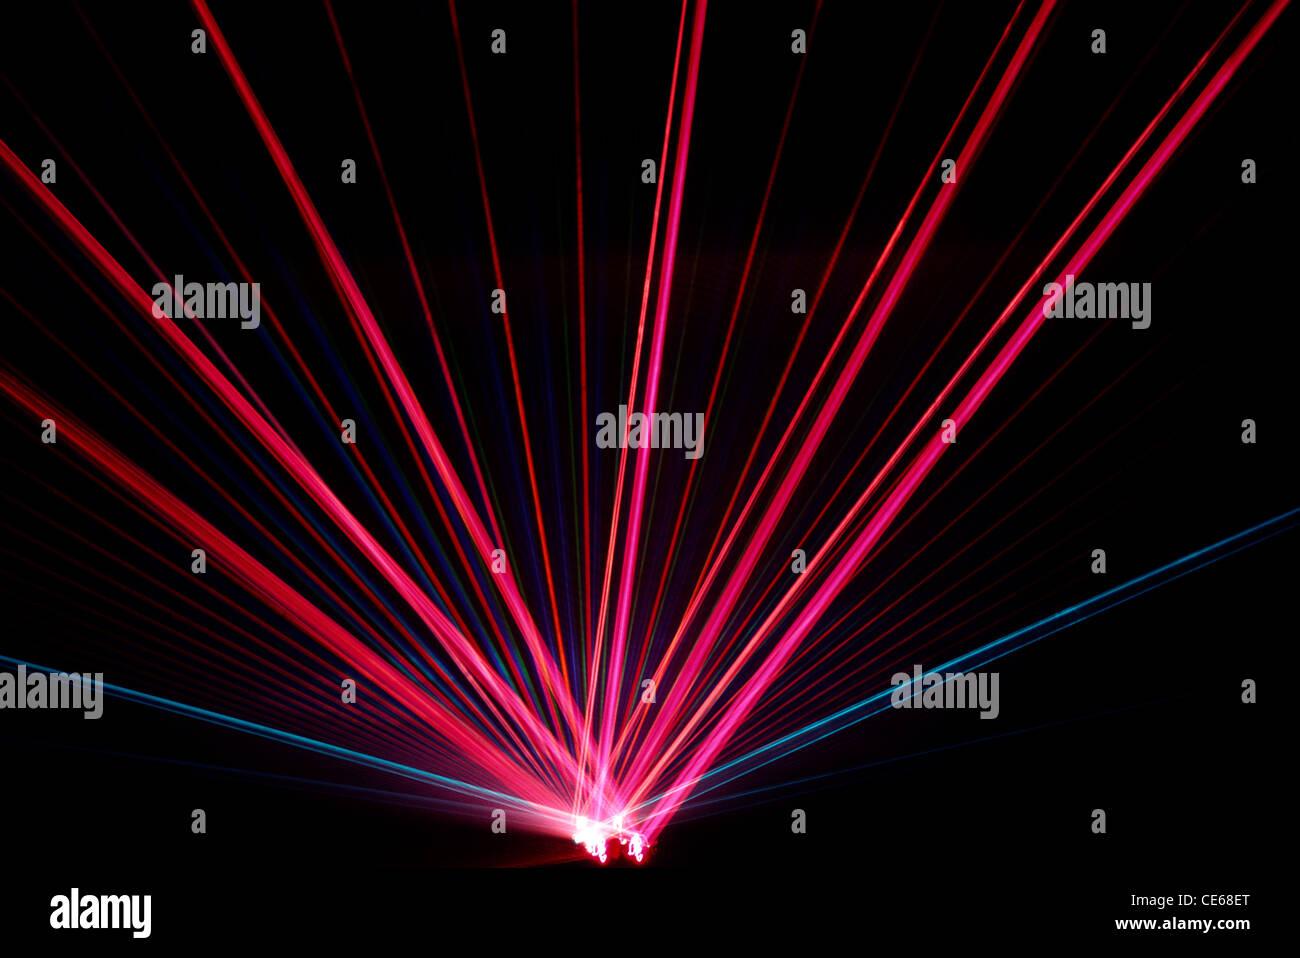 Laser light international Rajasthani conclave ; Jaipur ; Rajasthan ; India - Stock Image